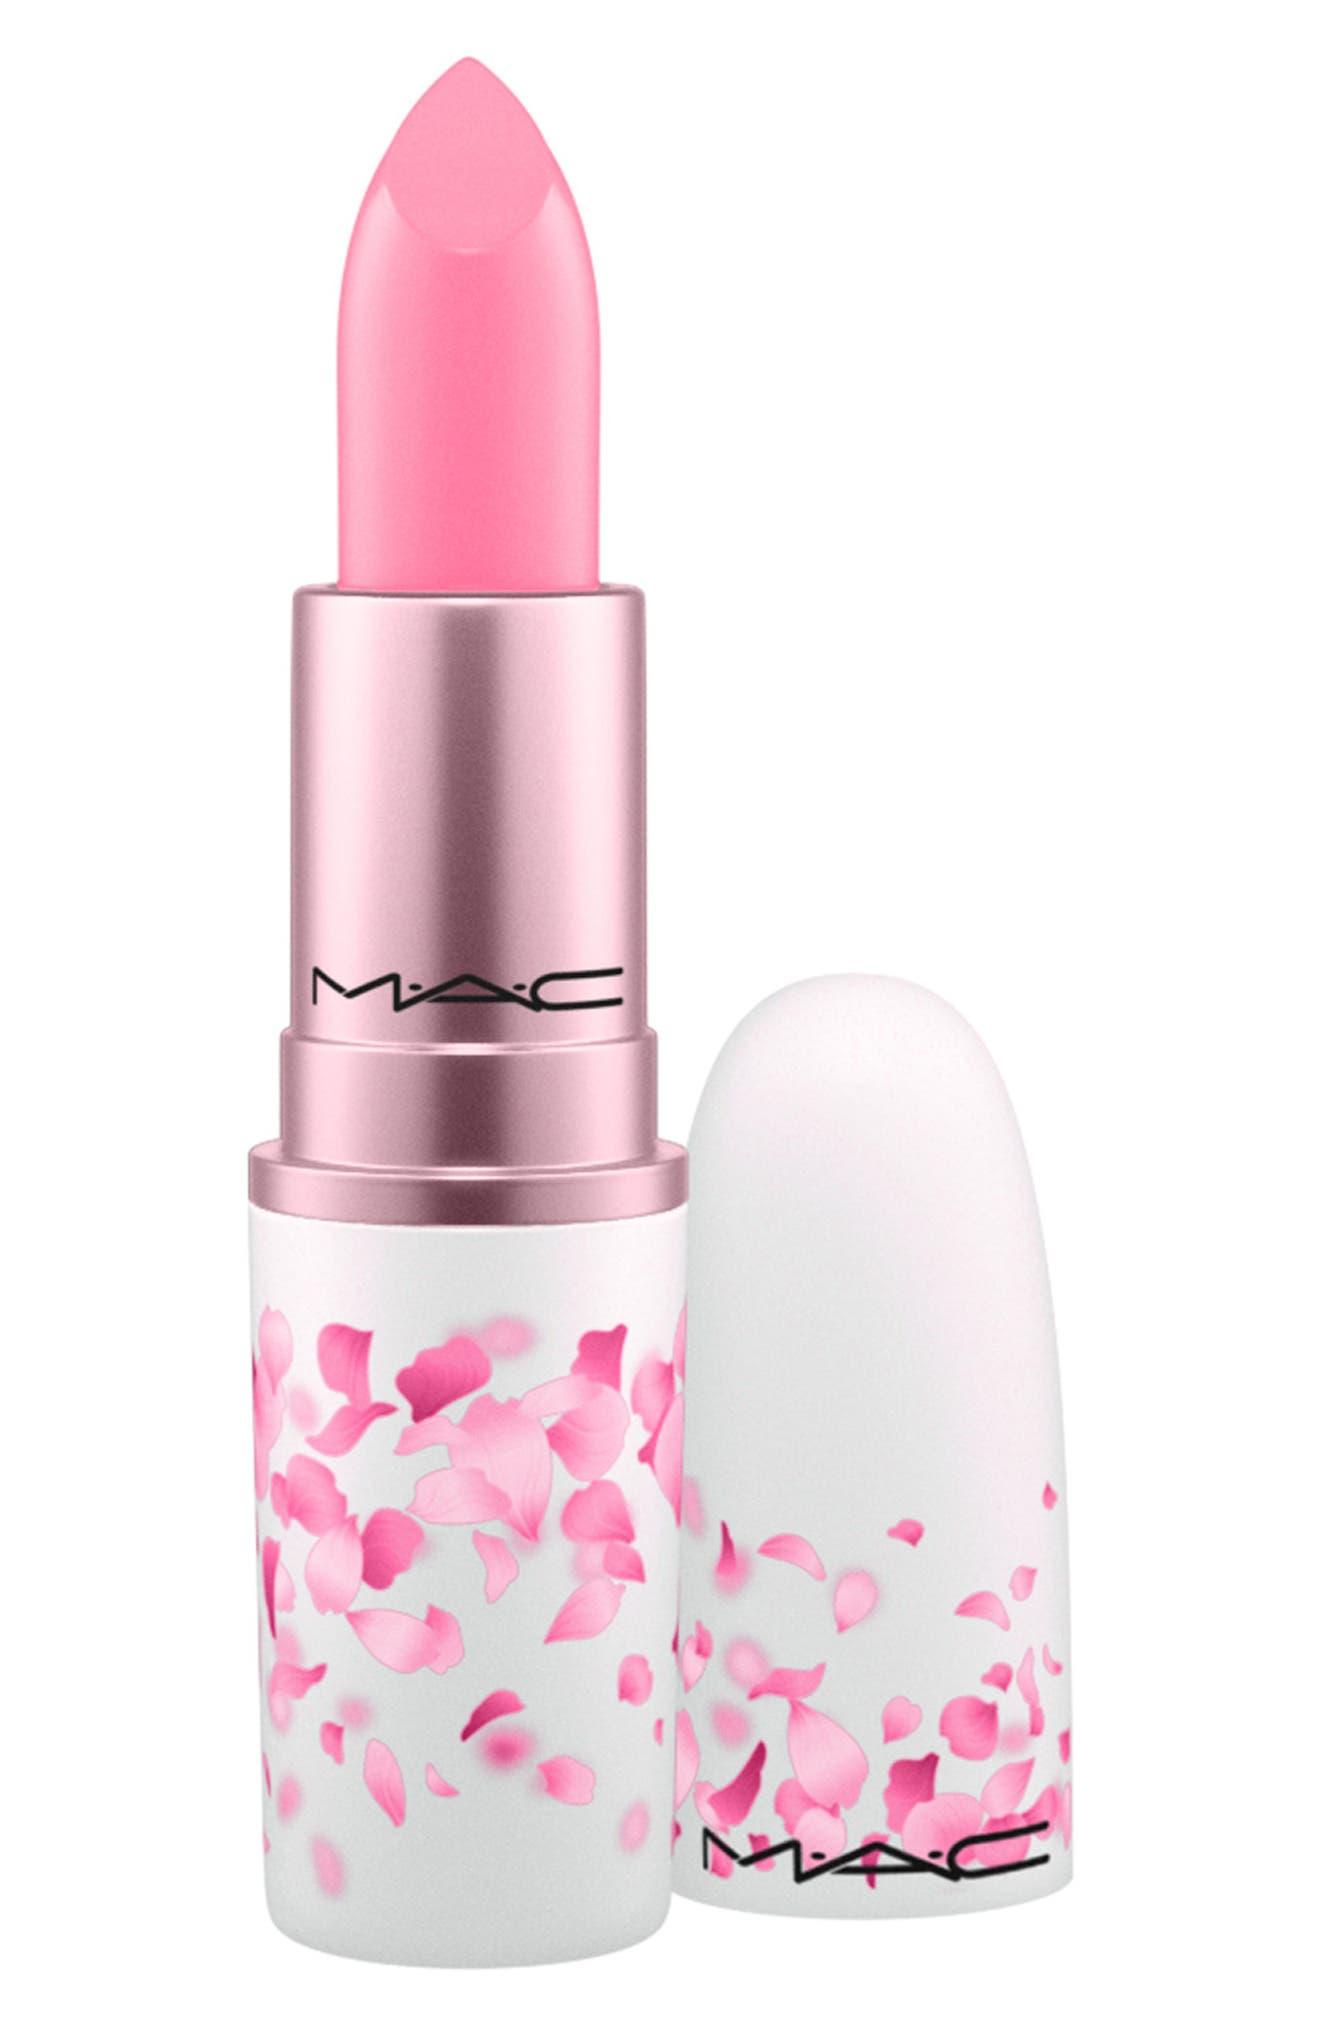 MAC COSMETICS MAC Boom, Boom, Bloom Lipstick, Main, color, 650